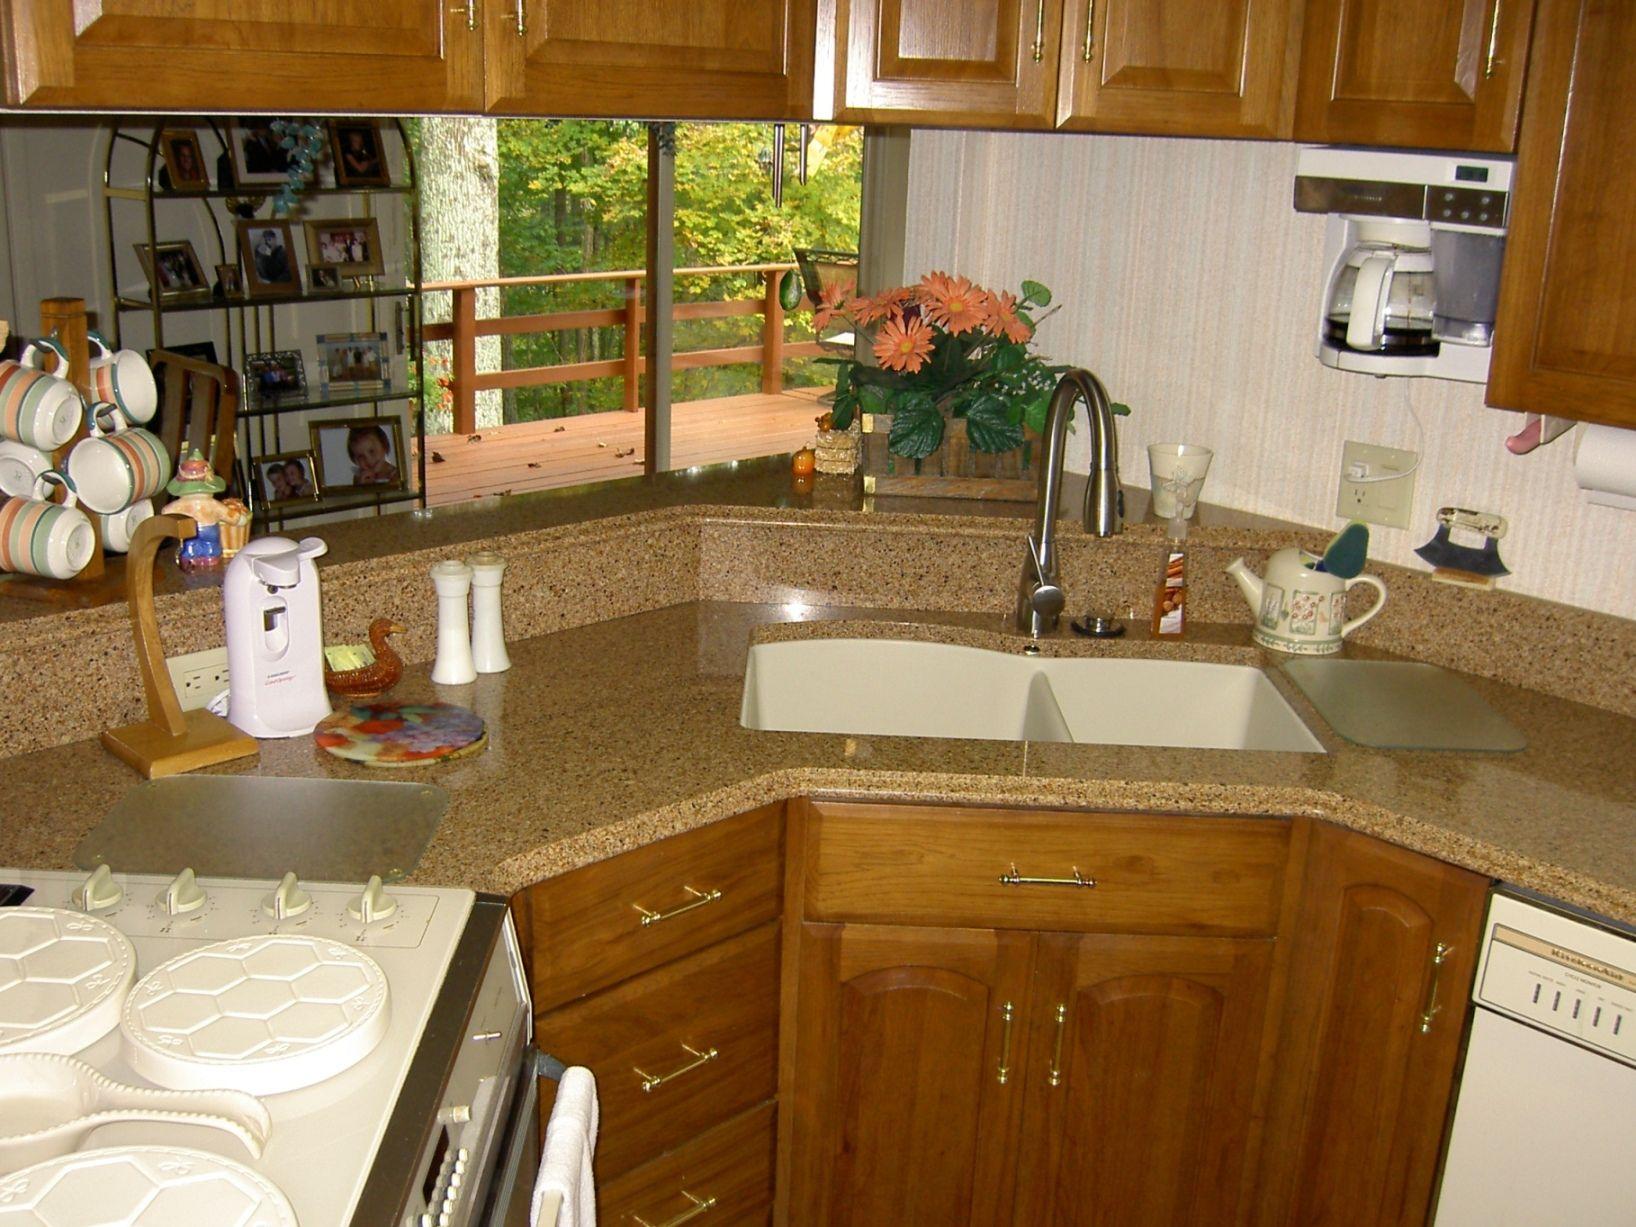 Oak Cabinets With Black Quartz Countertops